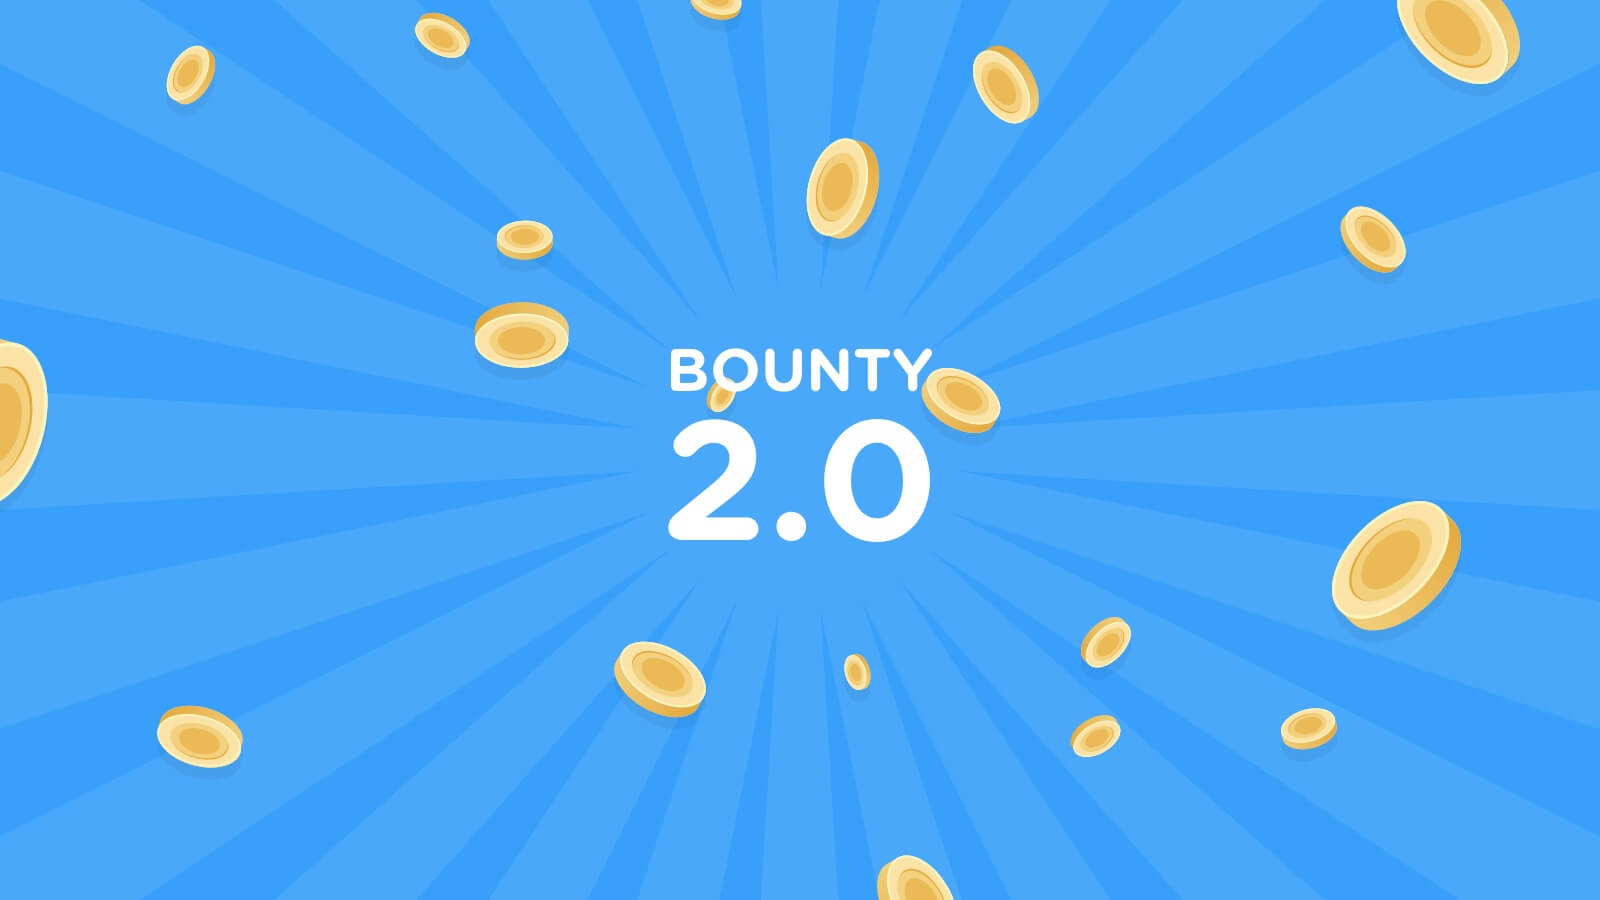 Introducing Bounty 2.0